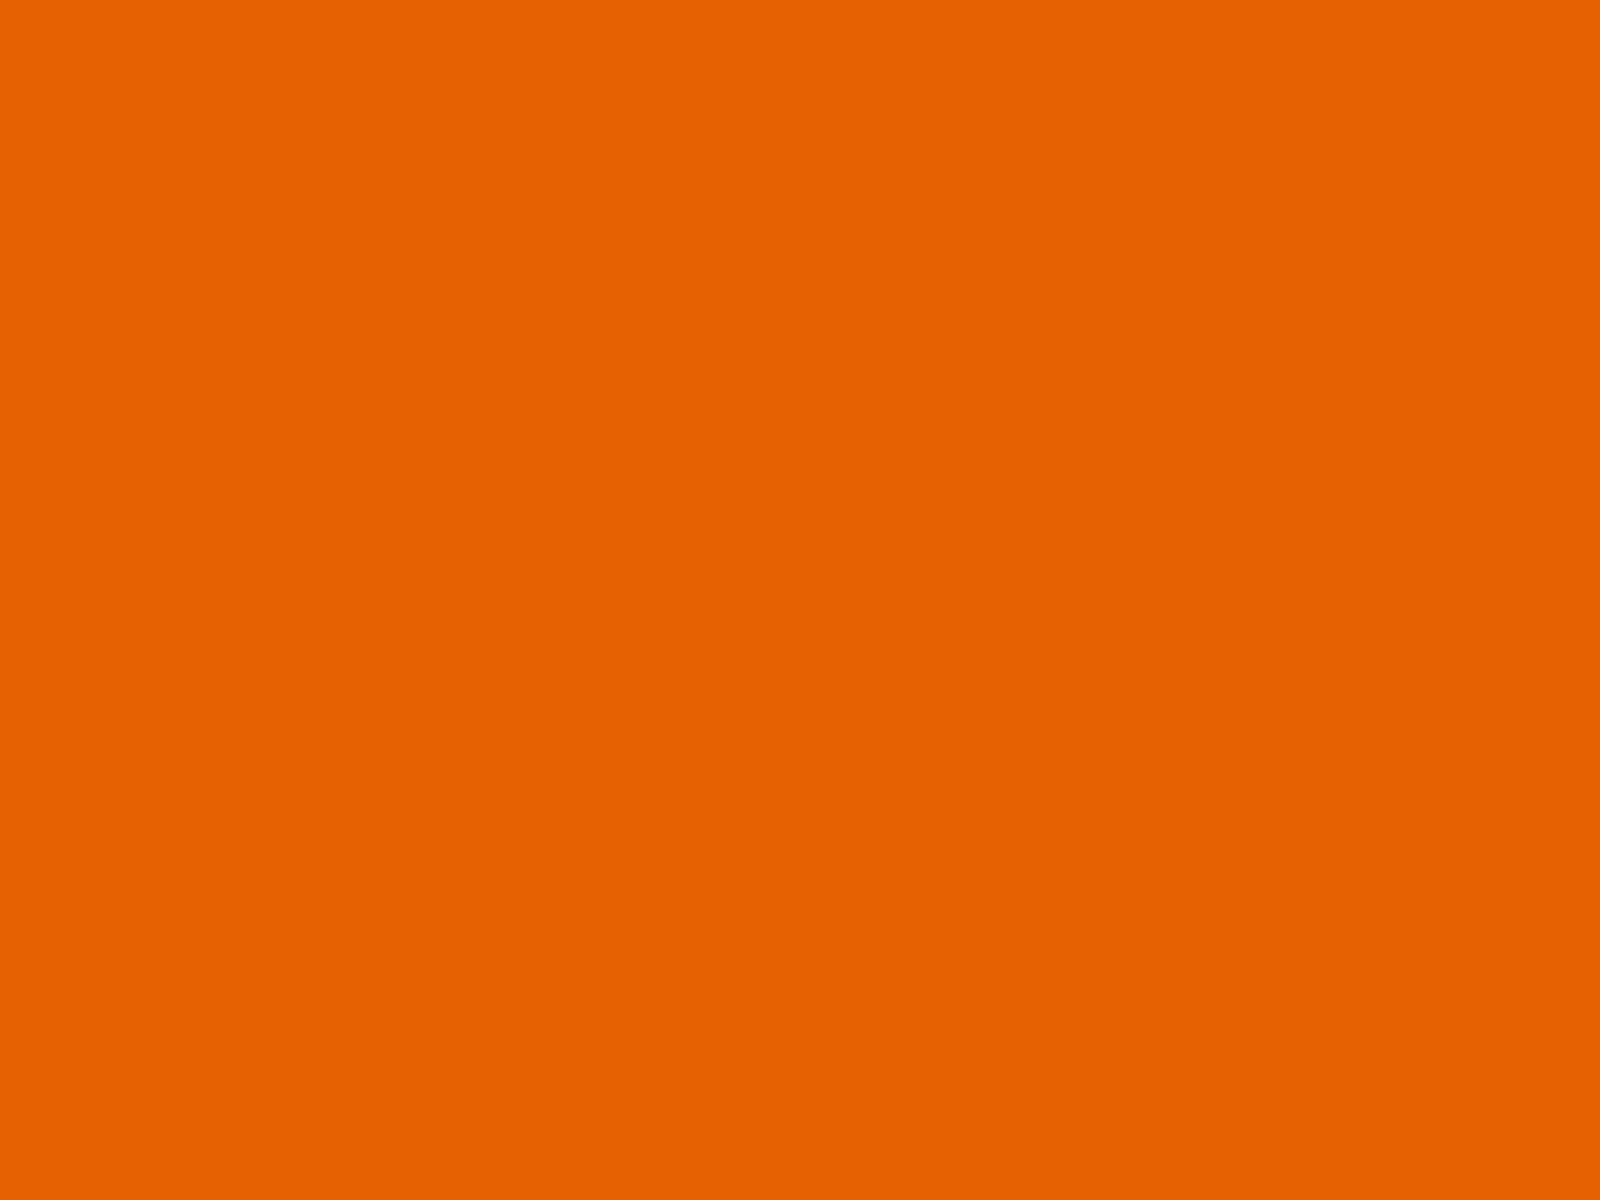 1600x1200 Spanish Orange Solid Color Background